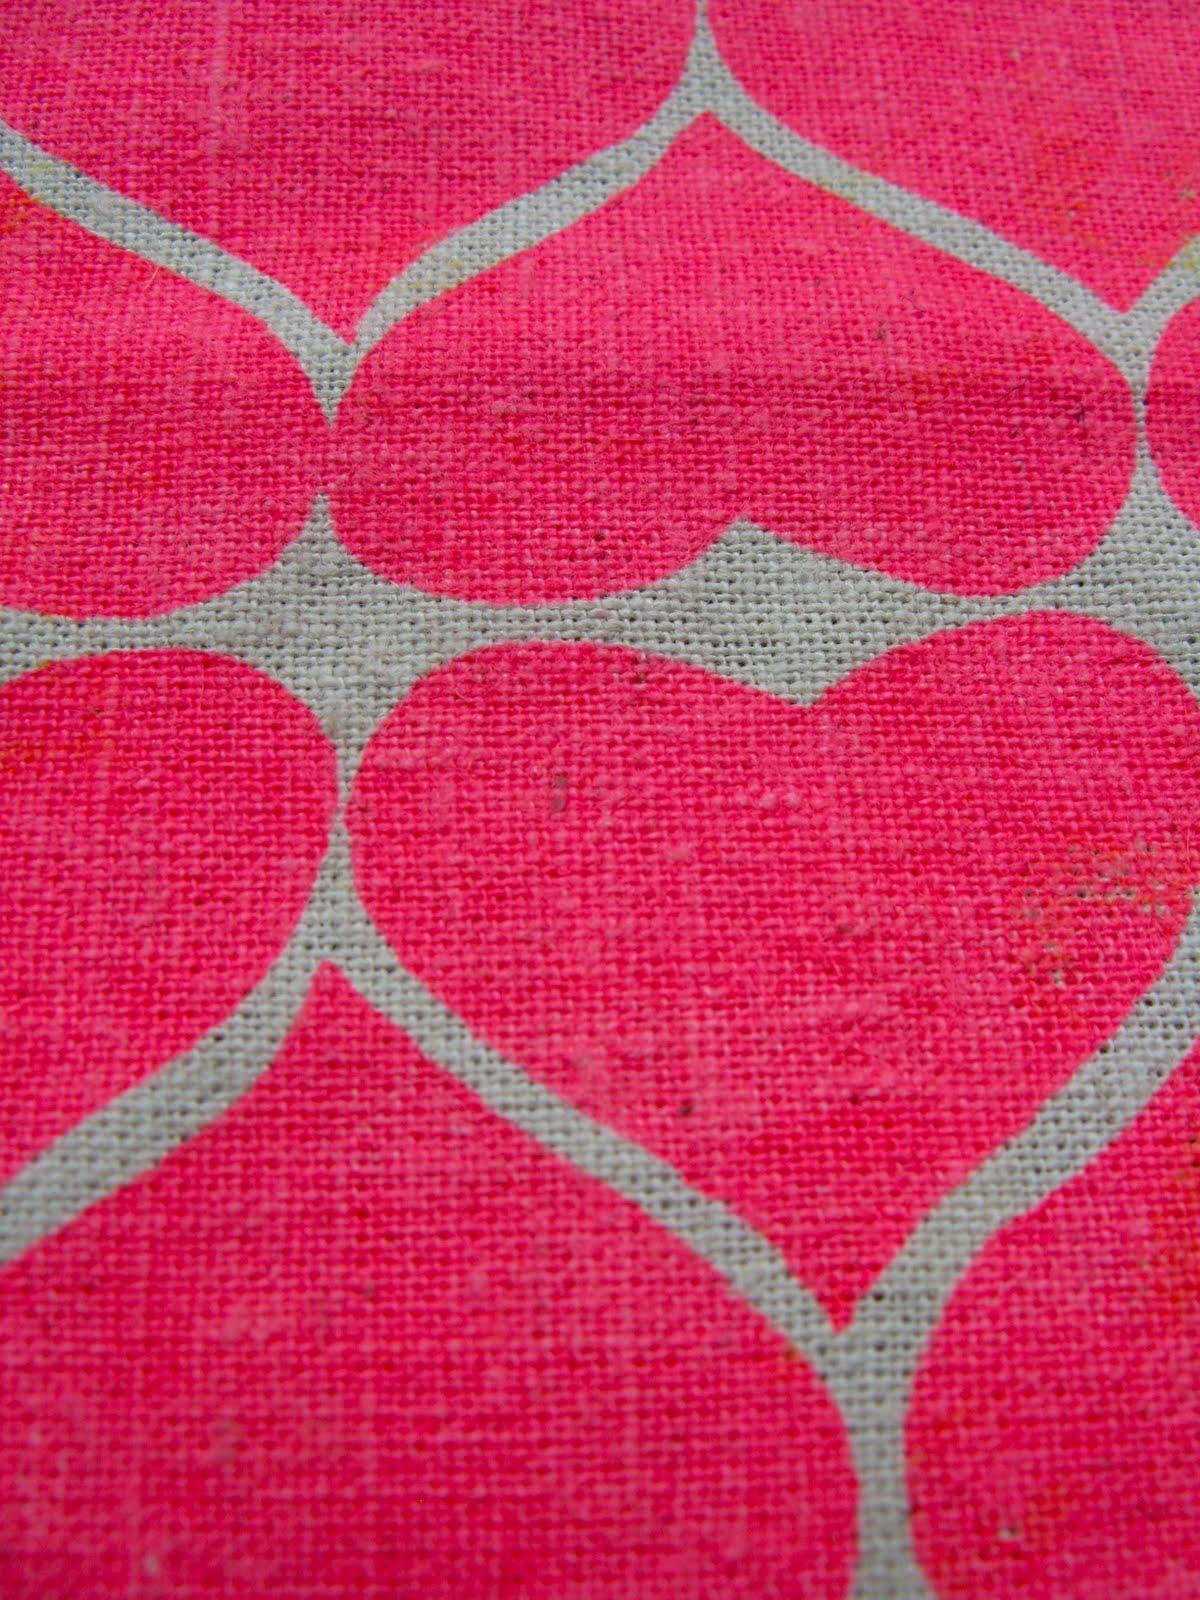 http://2.bp.blogspot.com/-U7Q-TB_RZBI/TaOjS2jdeHI/AAAAAAAADLY/aWsRVLvRFJw/s1600/Highlighter+Pink+Umbrella+Prints.JPG